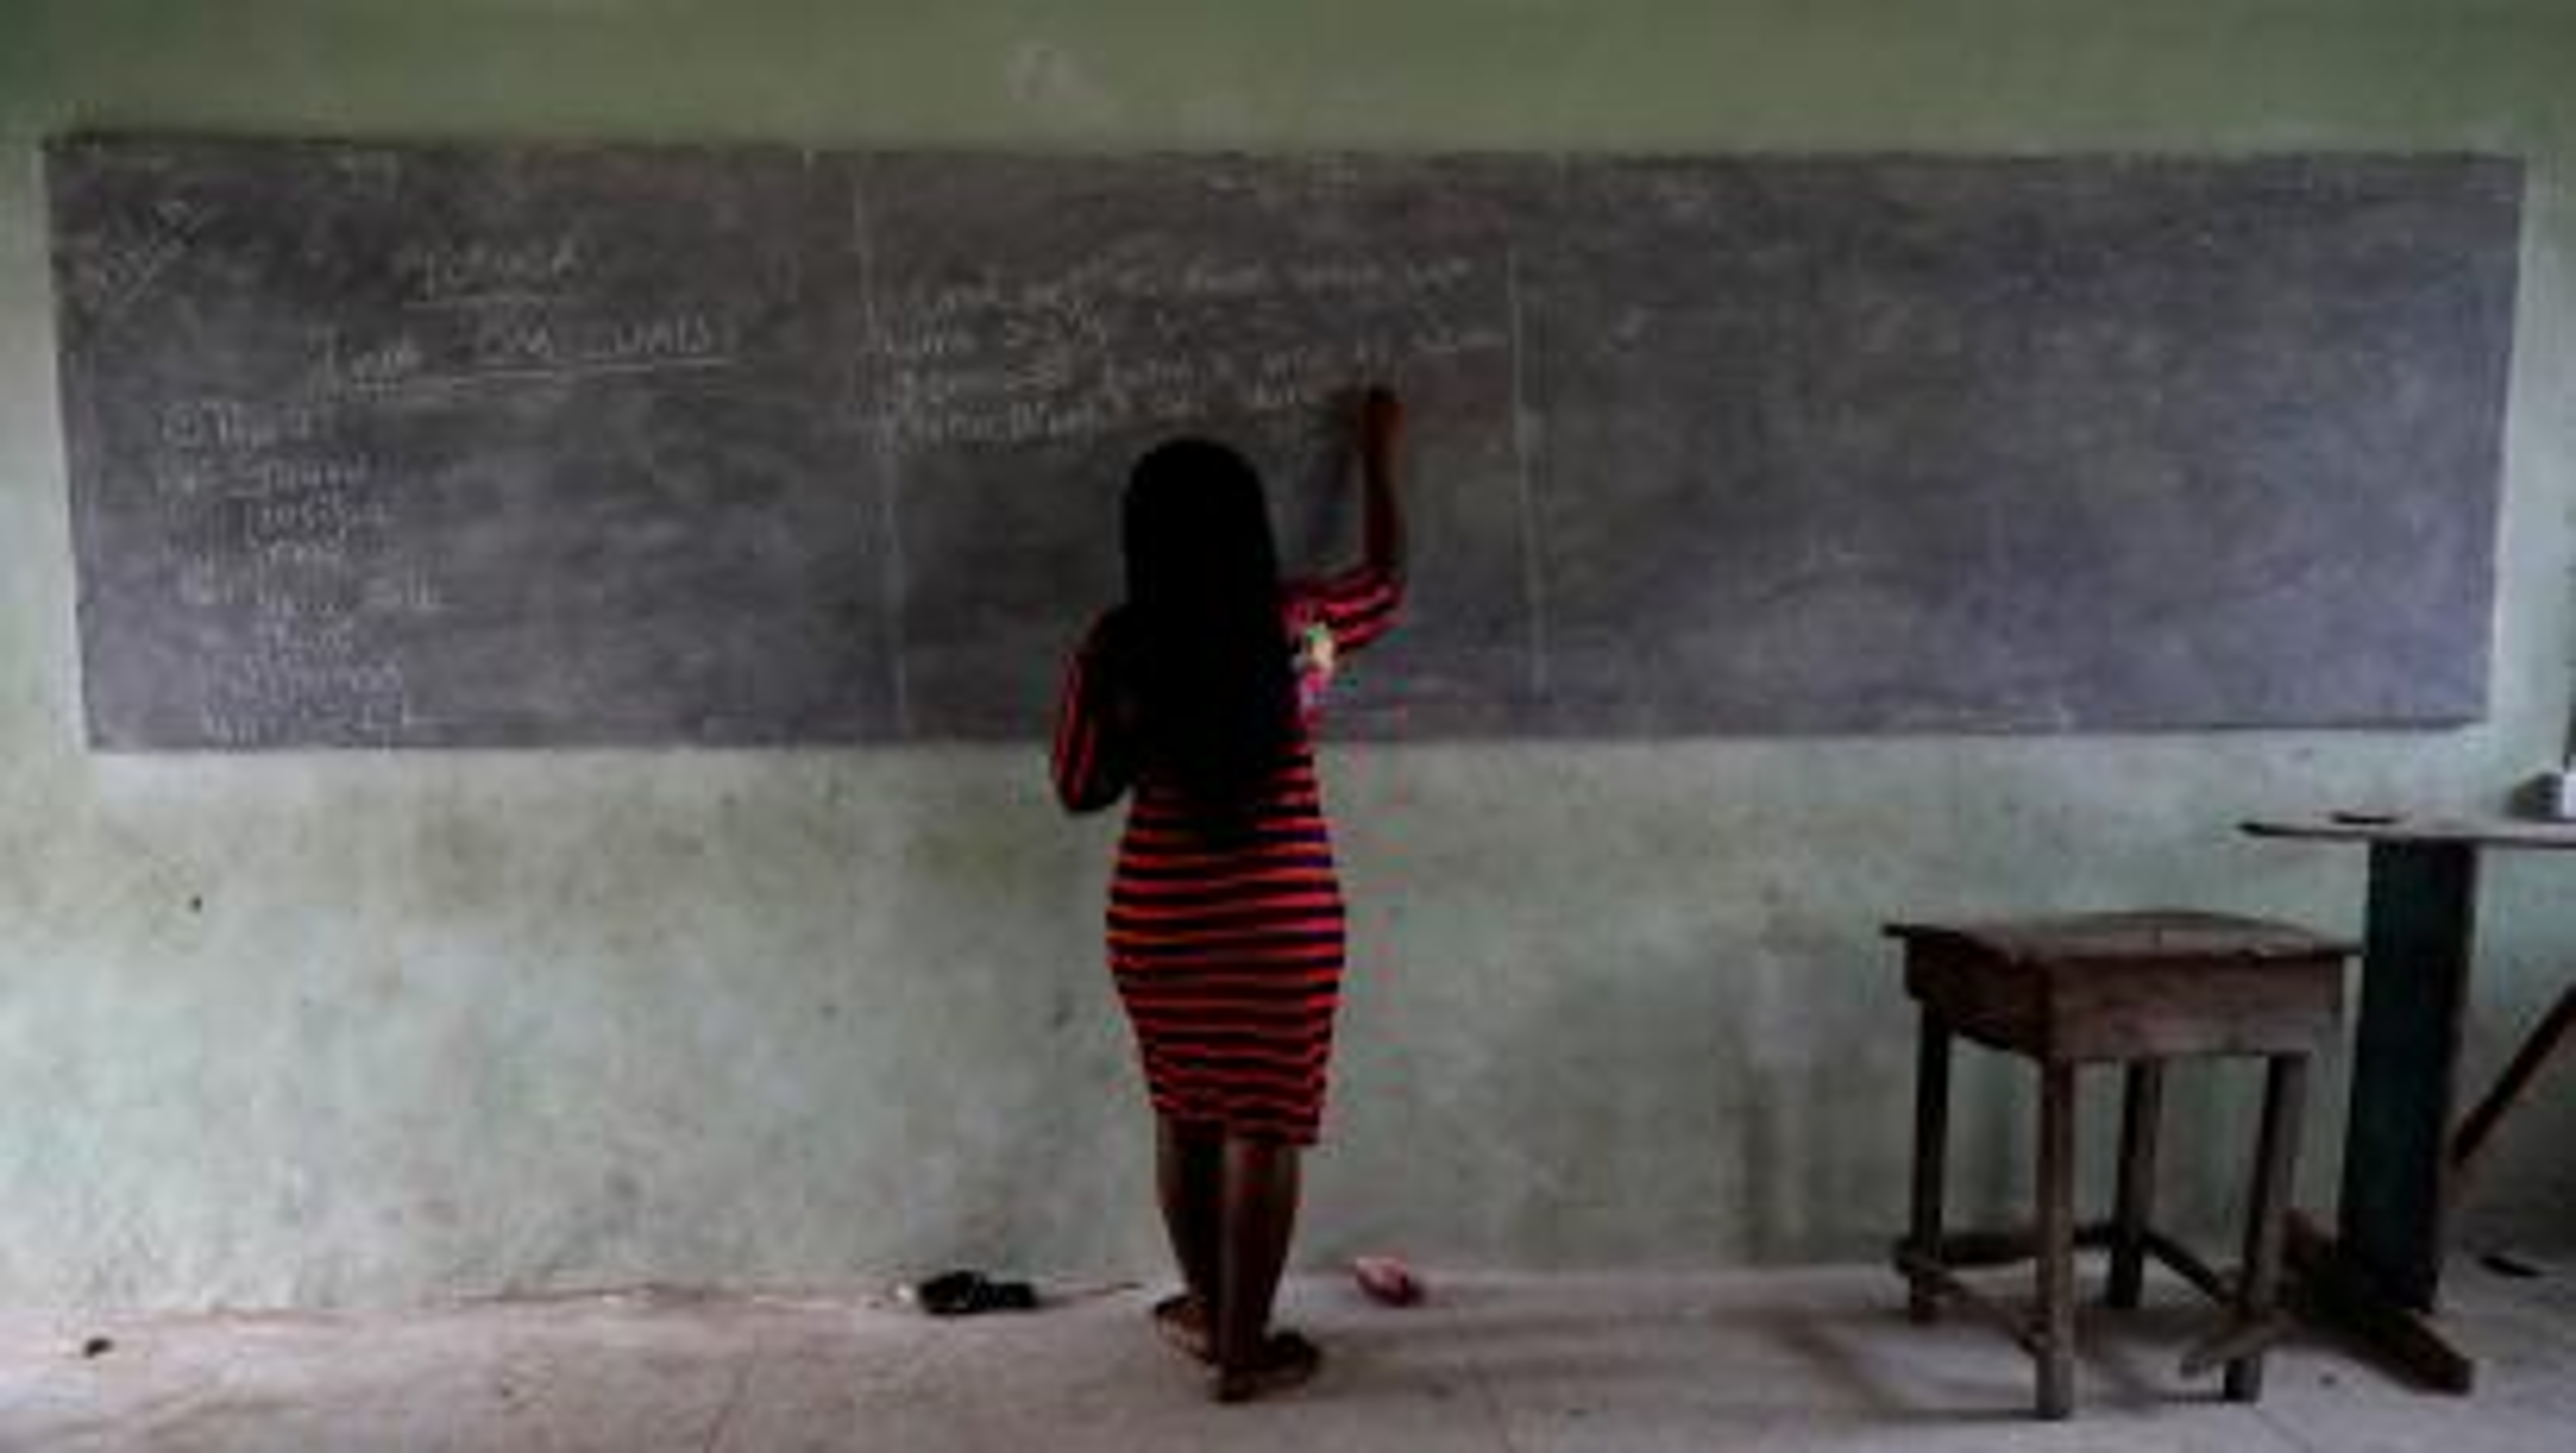 A teacher writes on a chalk board as she teaches a class at Ilorin Grammar School, in Ilorin, Kwara state, March 24, 2021.